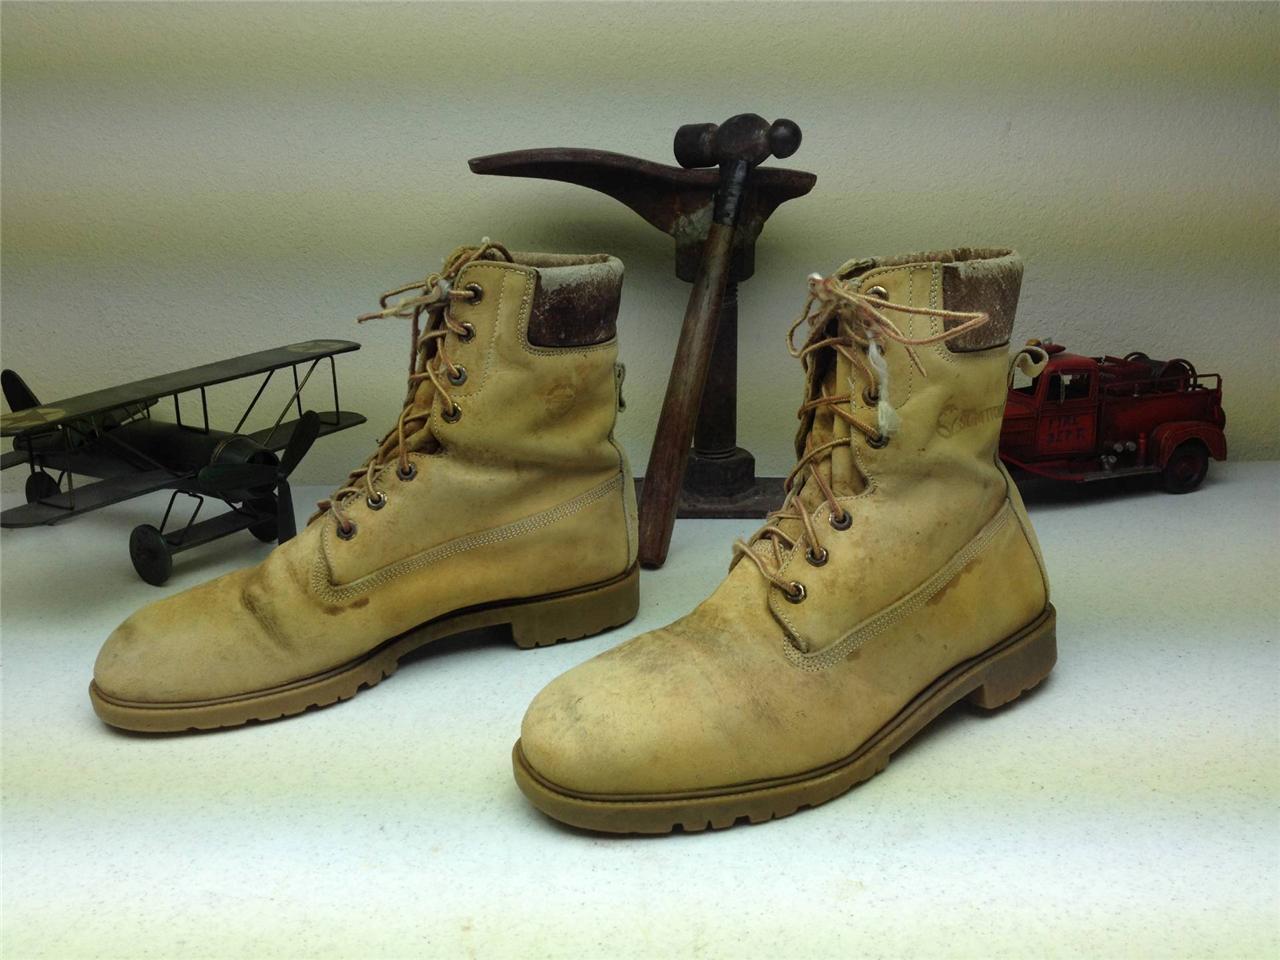 VINTAGE HERMAN SURVIVORS AMBER 20 BELOW 0 MADE IN USA LACE UP PACKER stivali 12 N